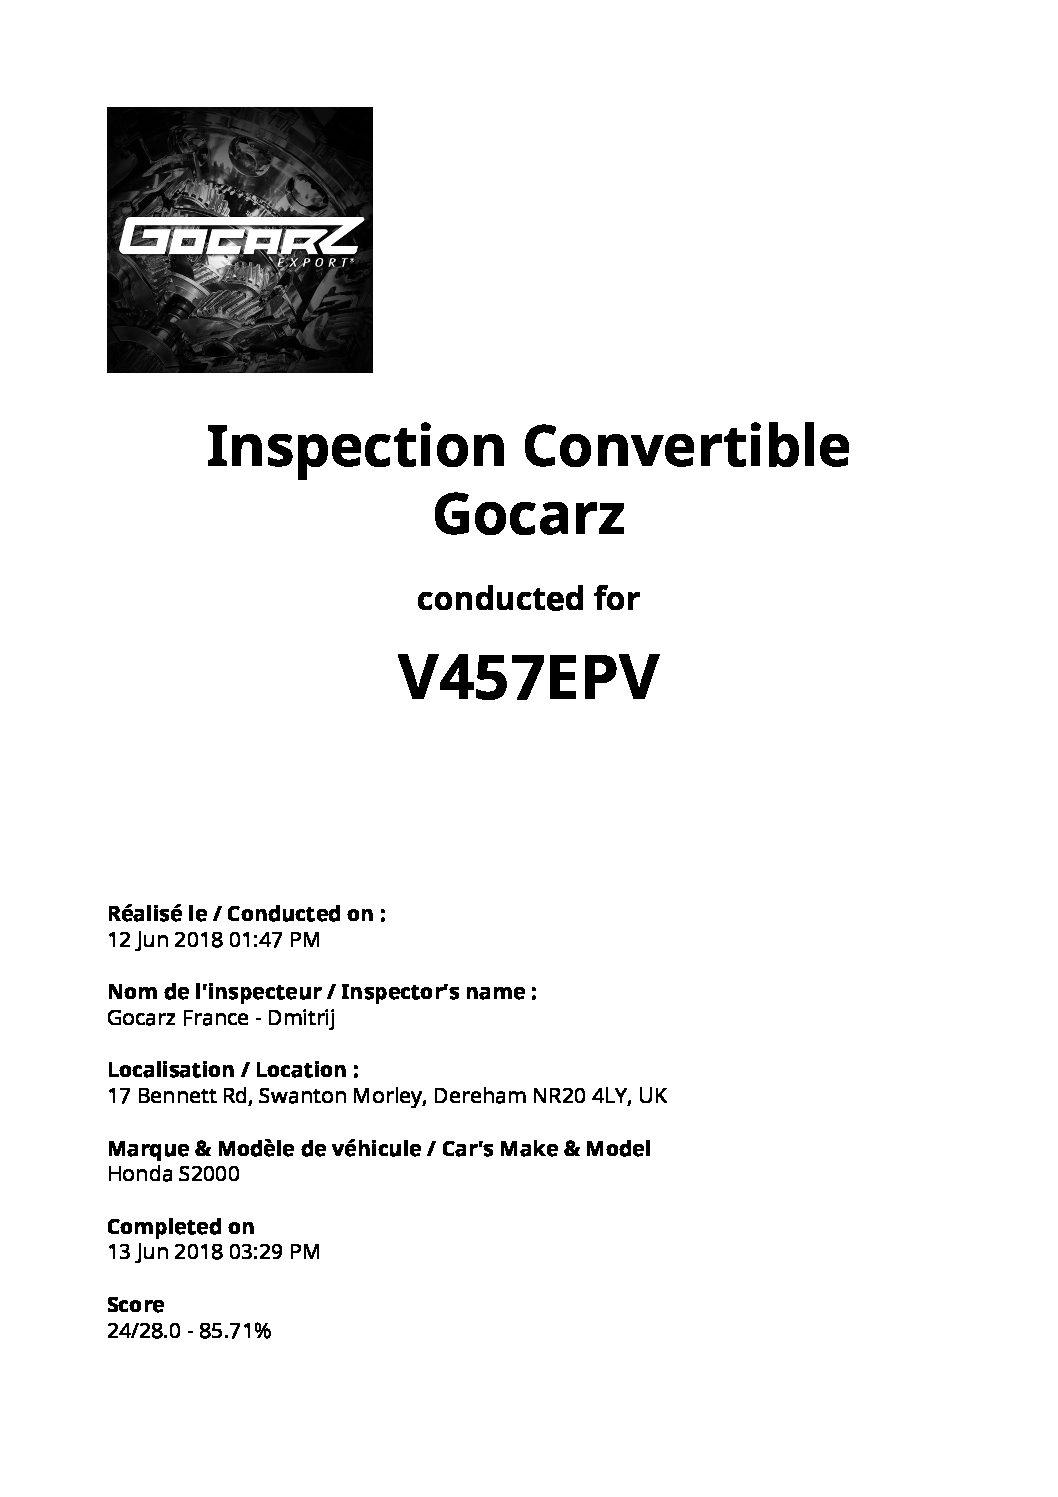 Inspection Gocarz - Honda S2000 - 2018.06.12